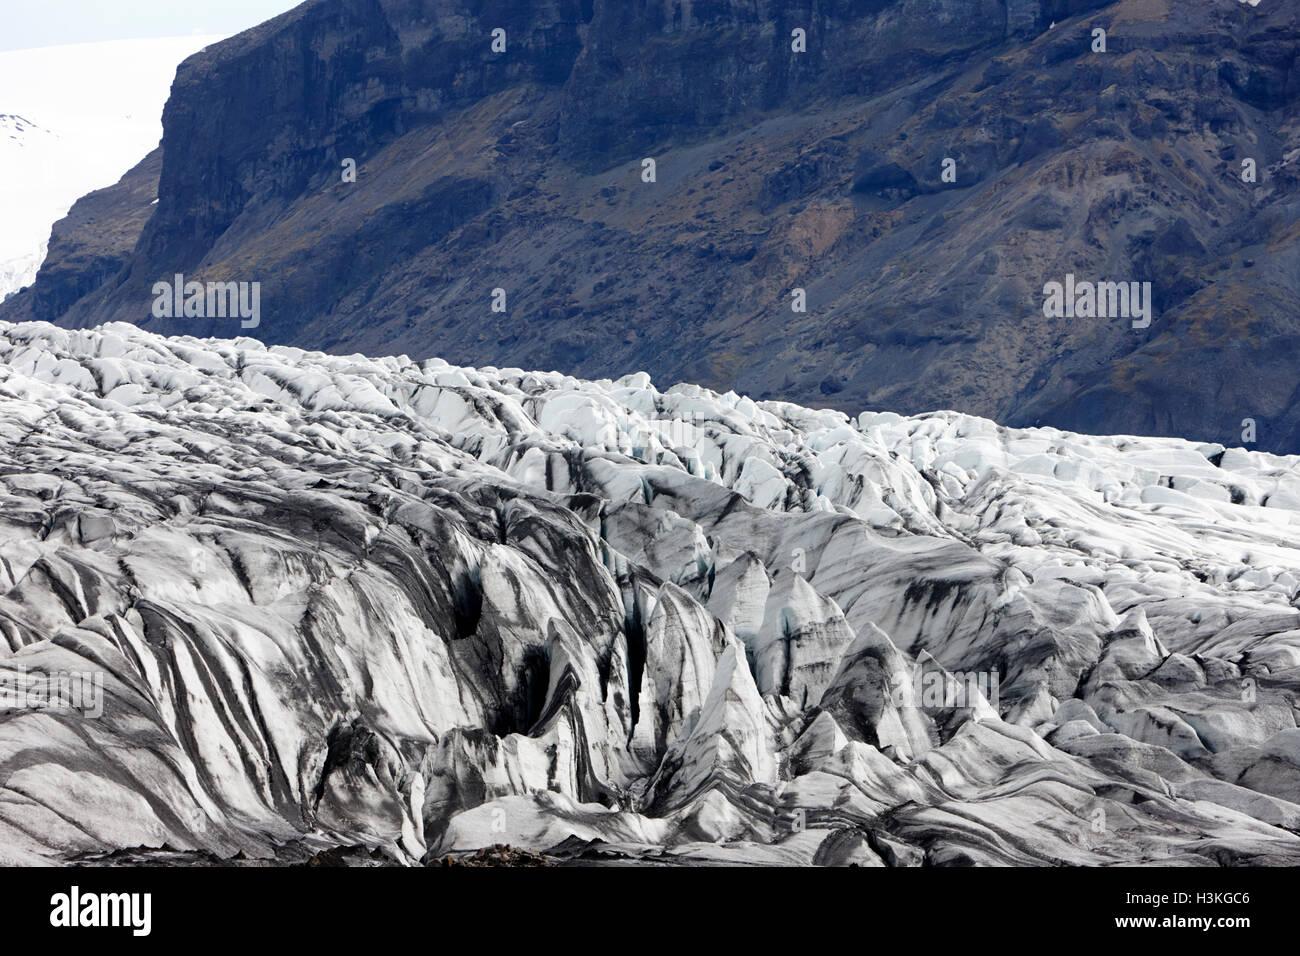 fissures in Skaftafell glacier Vatnajokull national park in Iceland - Stock Image